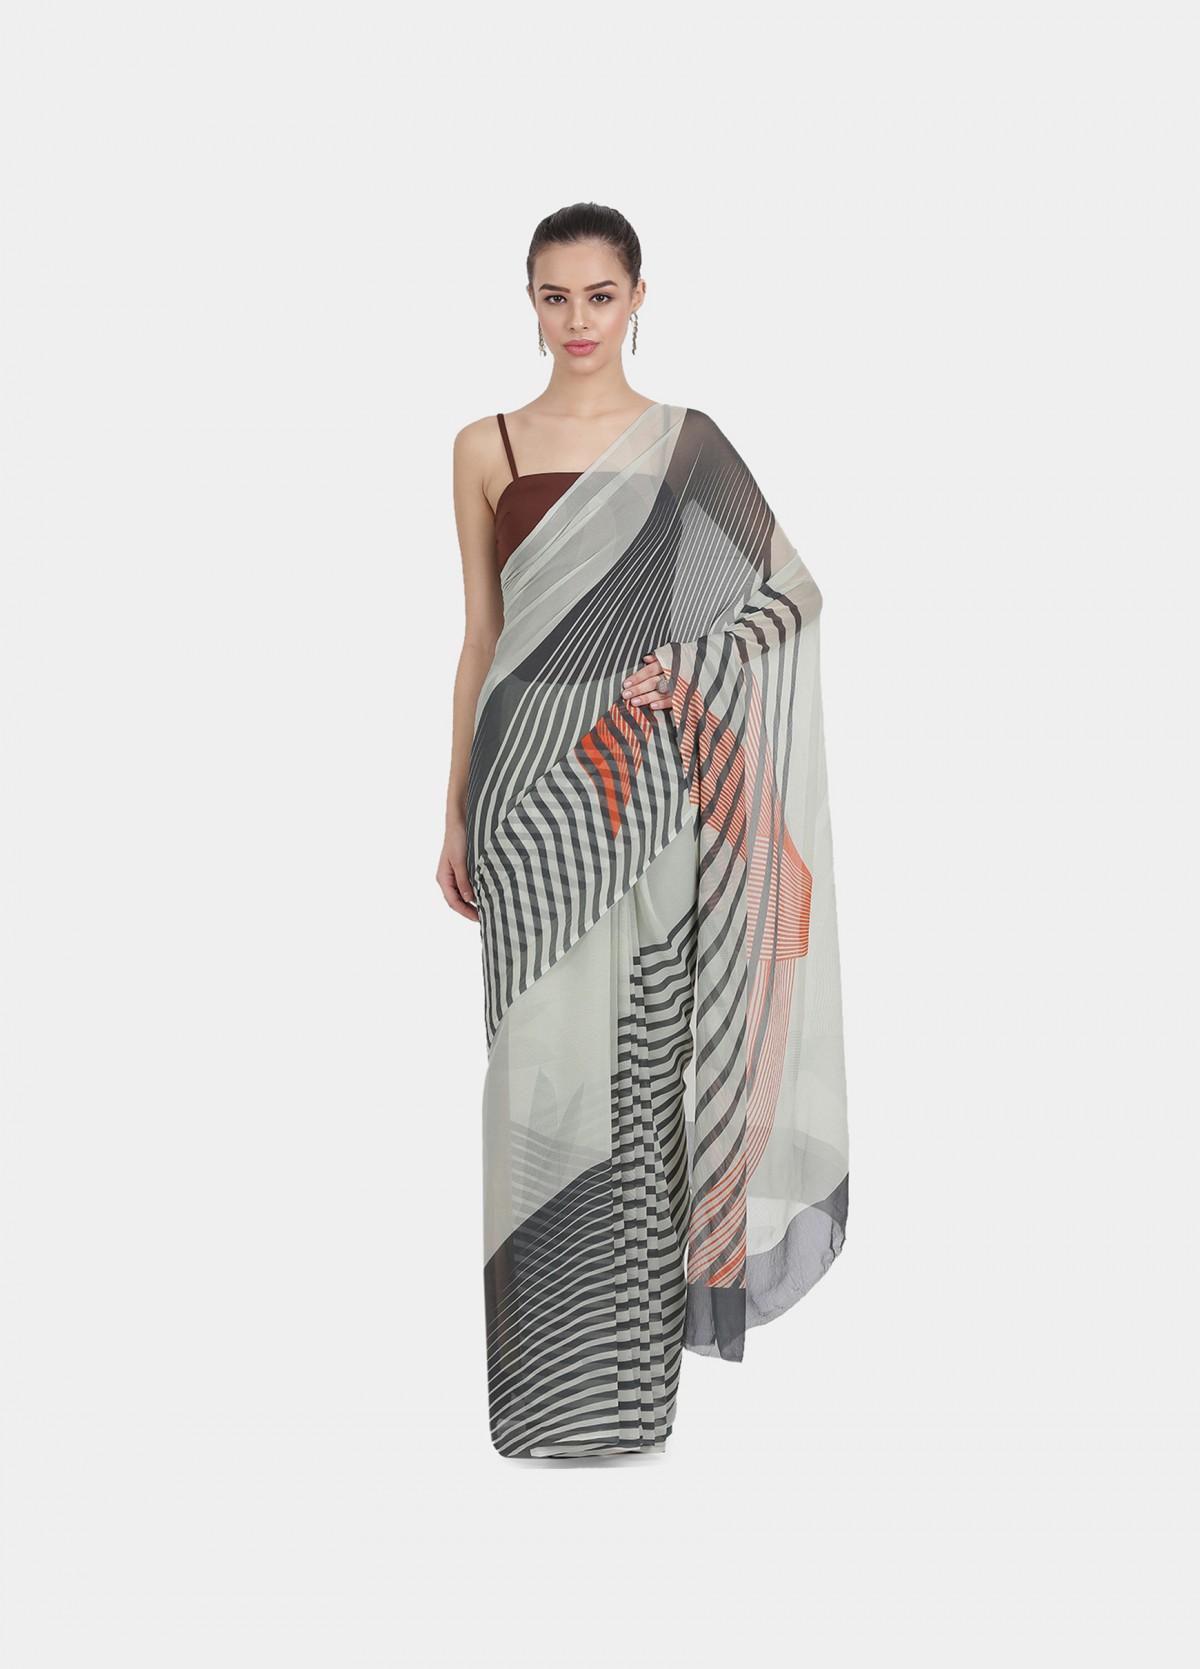 The Freedom Sari